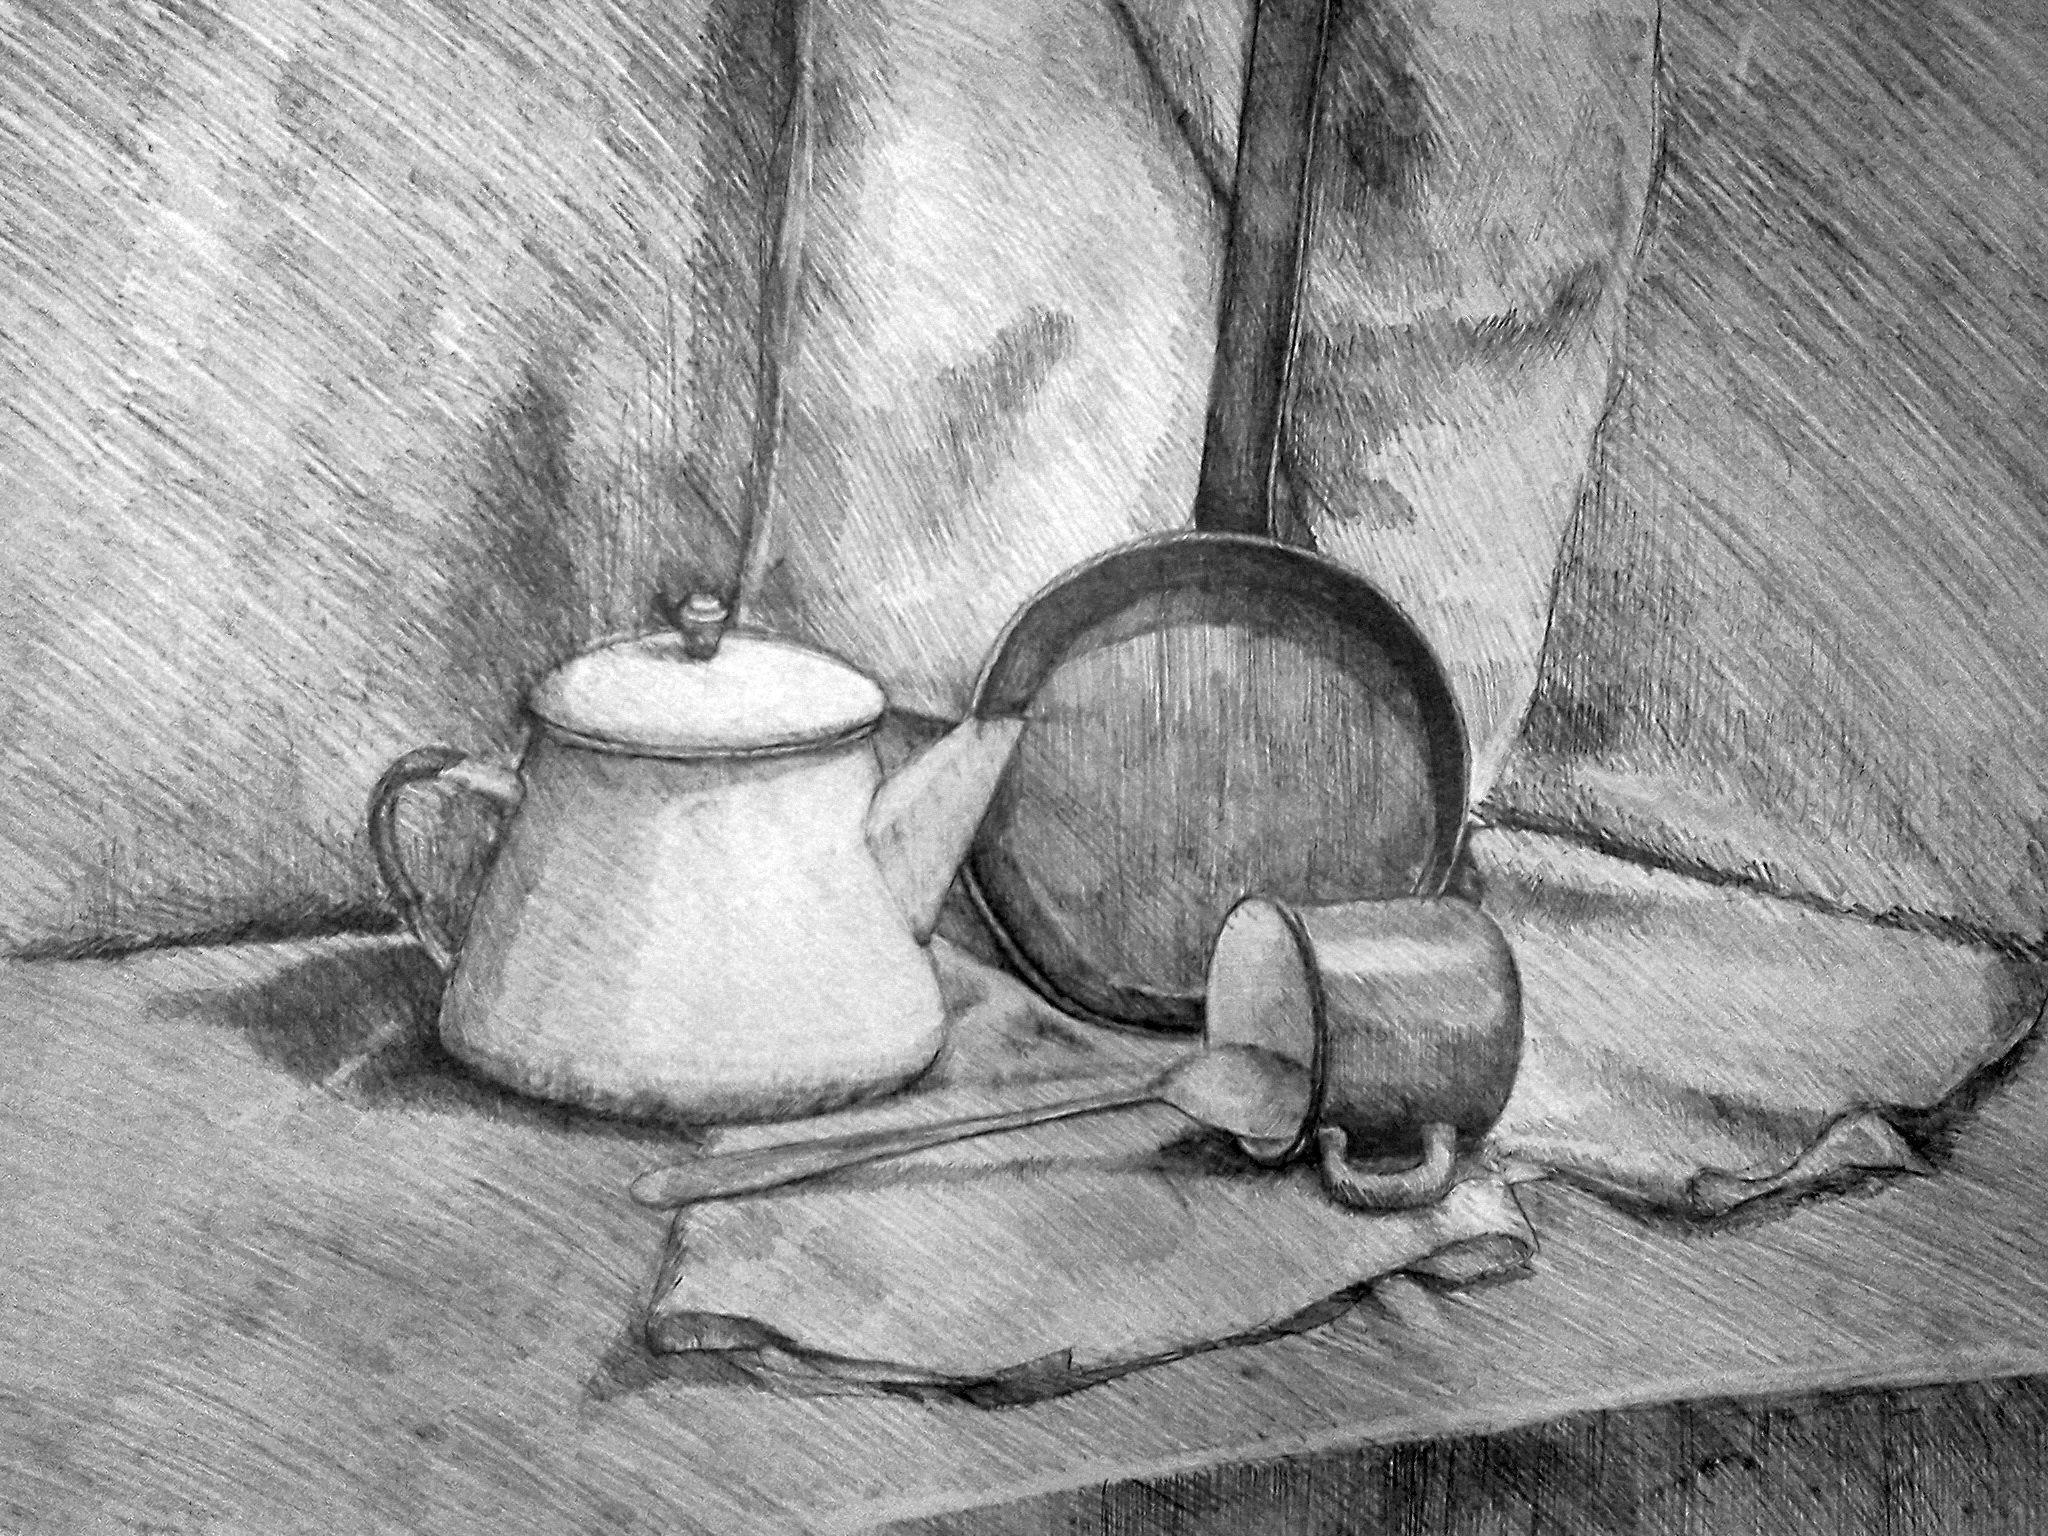 натюрморт рисунок: